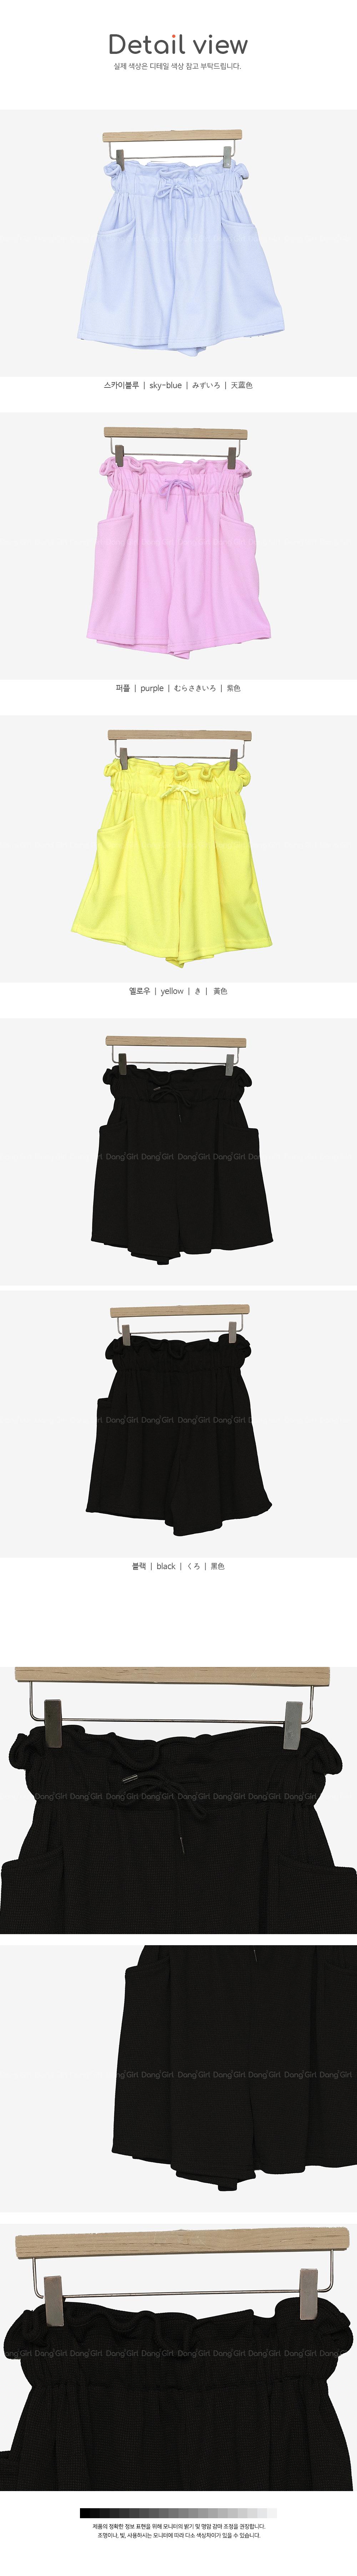 26-32 inch pocket ruffle banding training pants